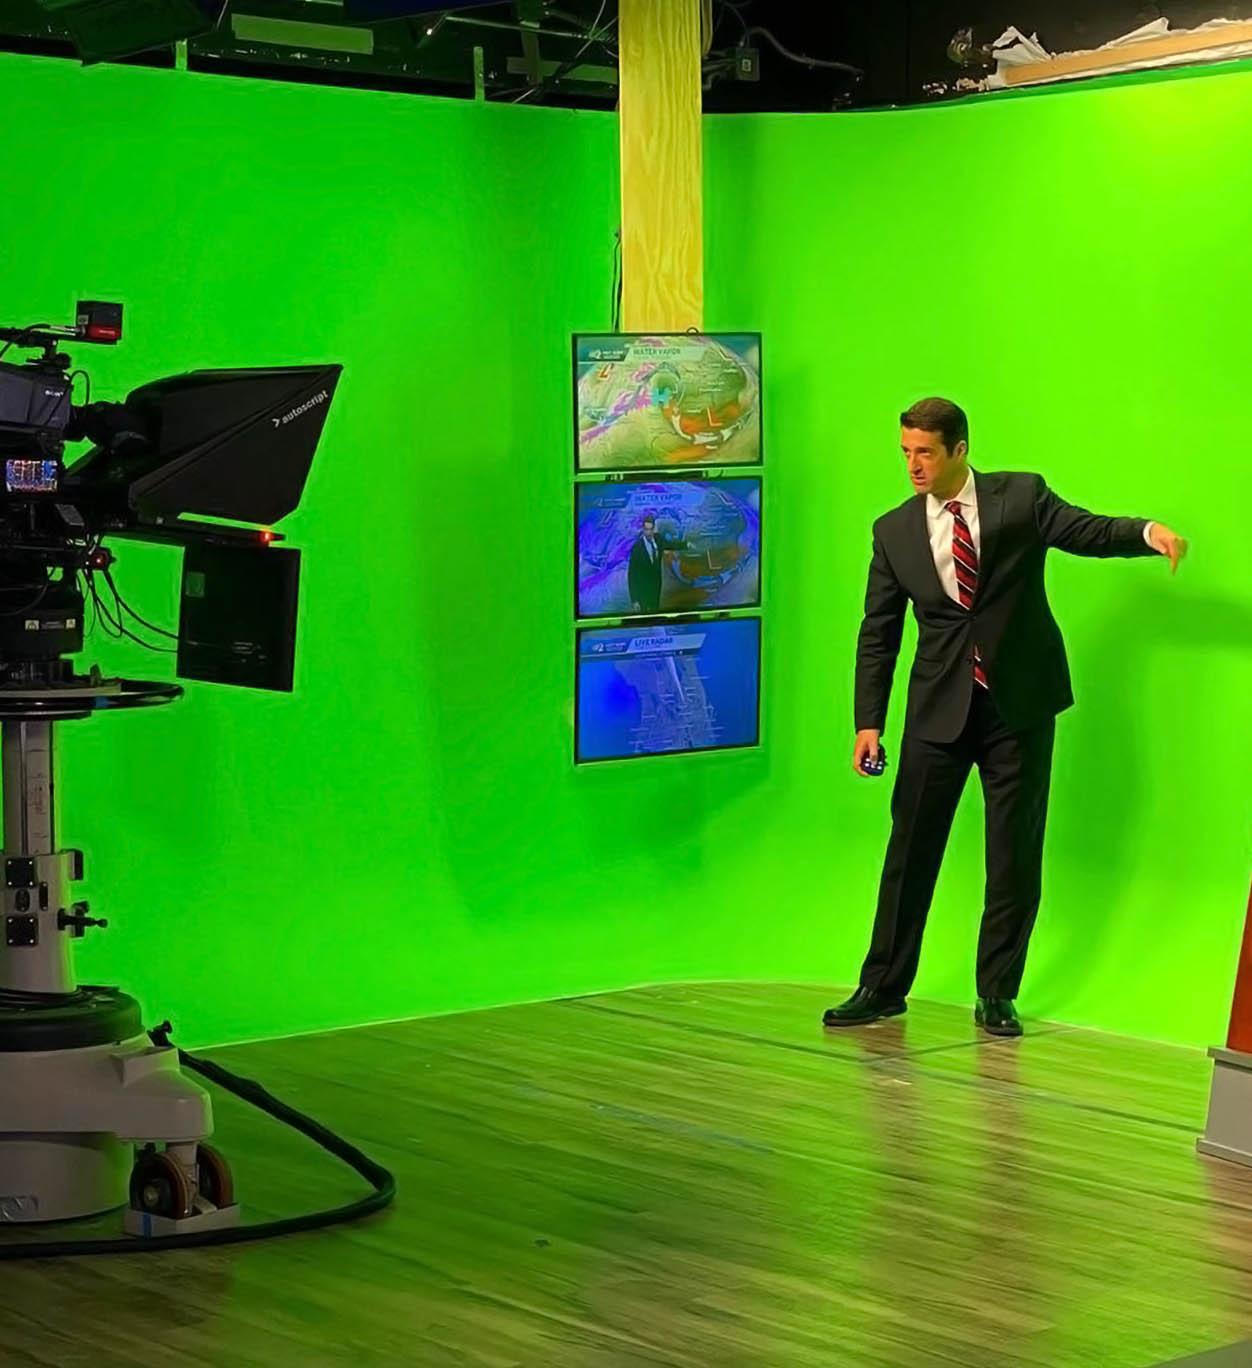 Tony Mainolfi on green screen